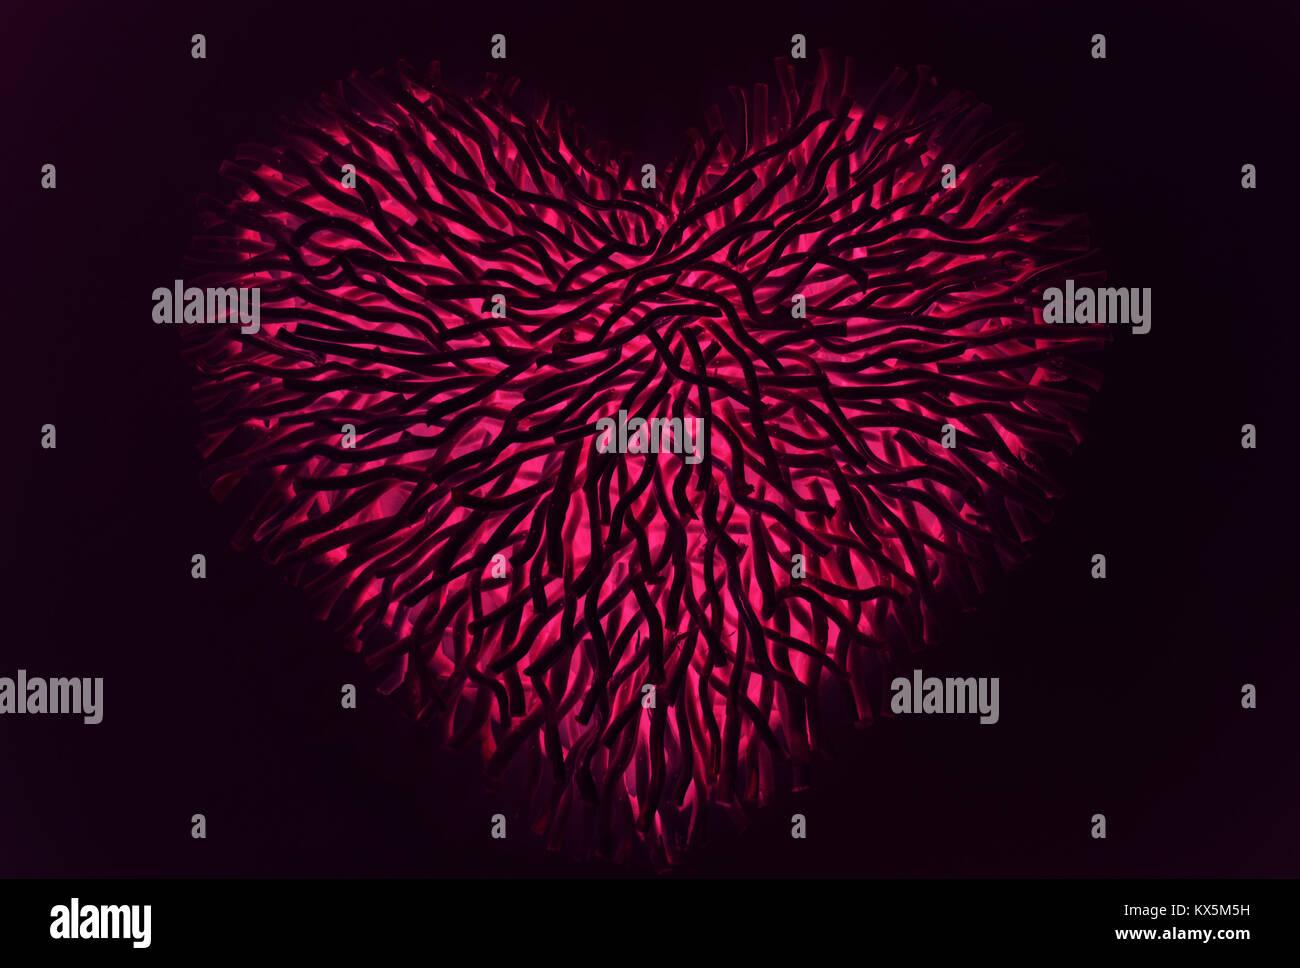 Valentines heart shape Photo Stock